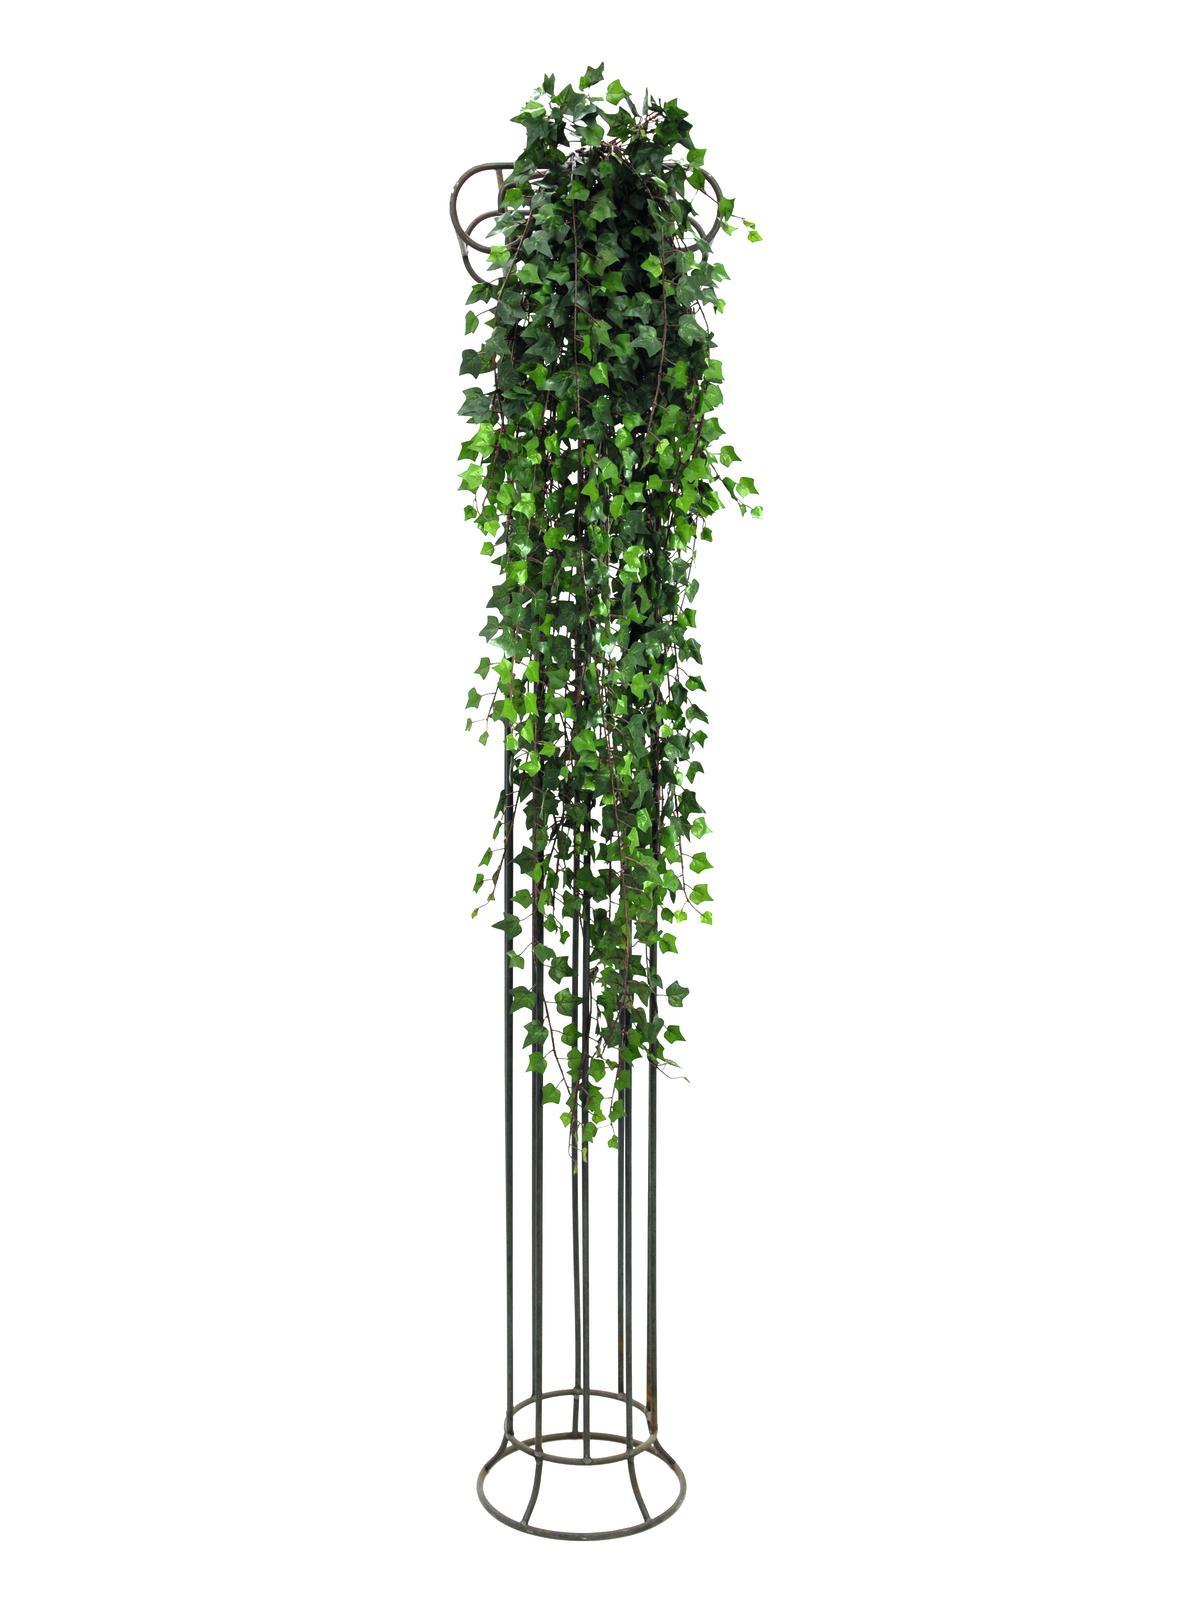 EUROPALMS Deluxe ivy viticcio, grün, 160cm